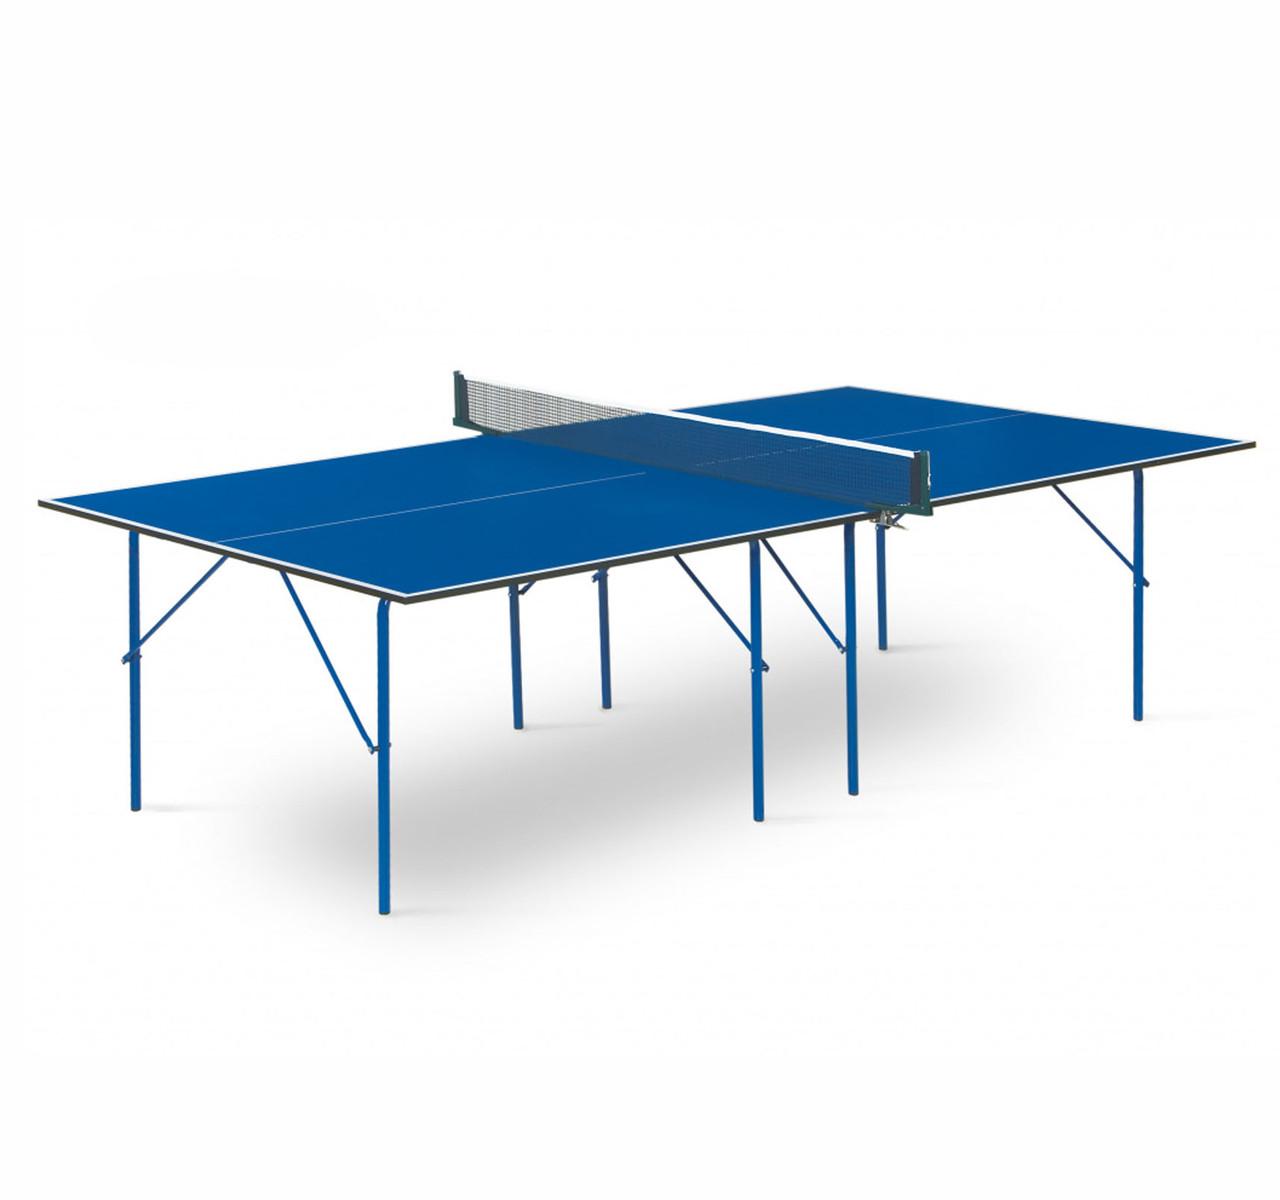 Теннисный стол Start line HOBBY - 2 Blue - фото 1